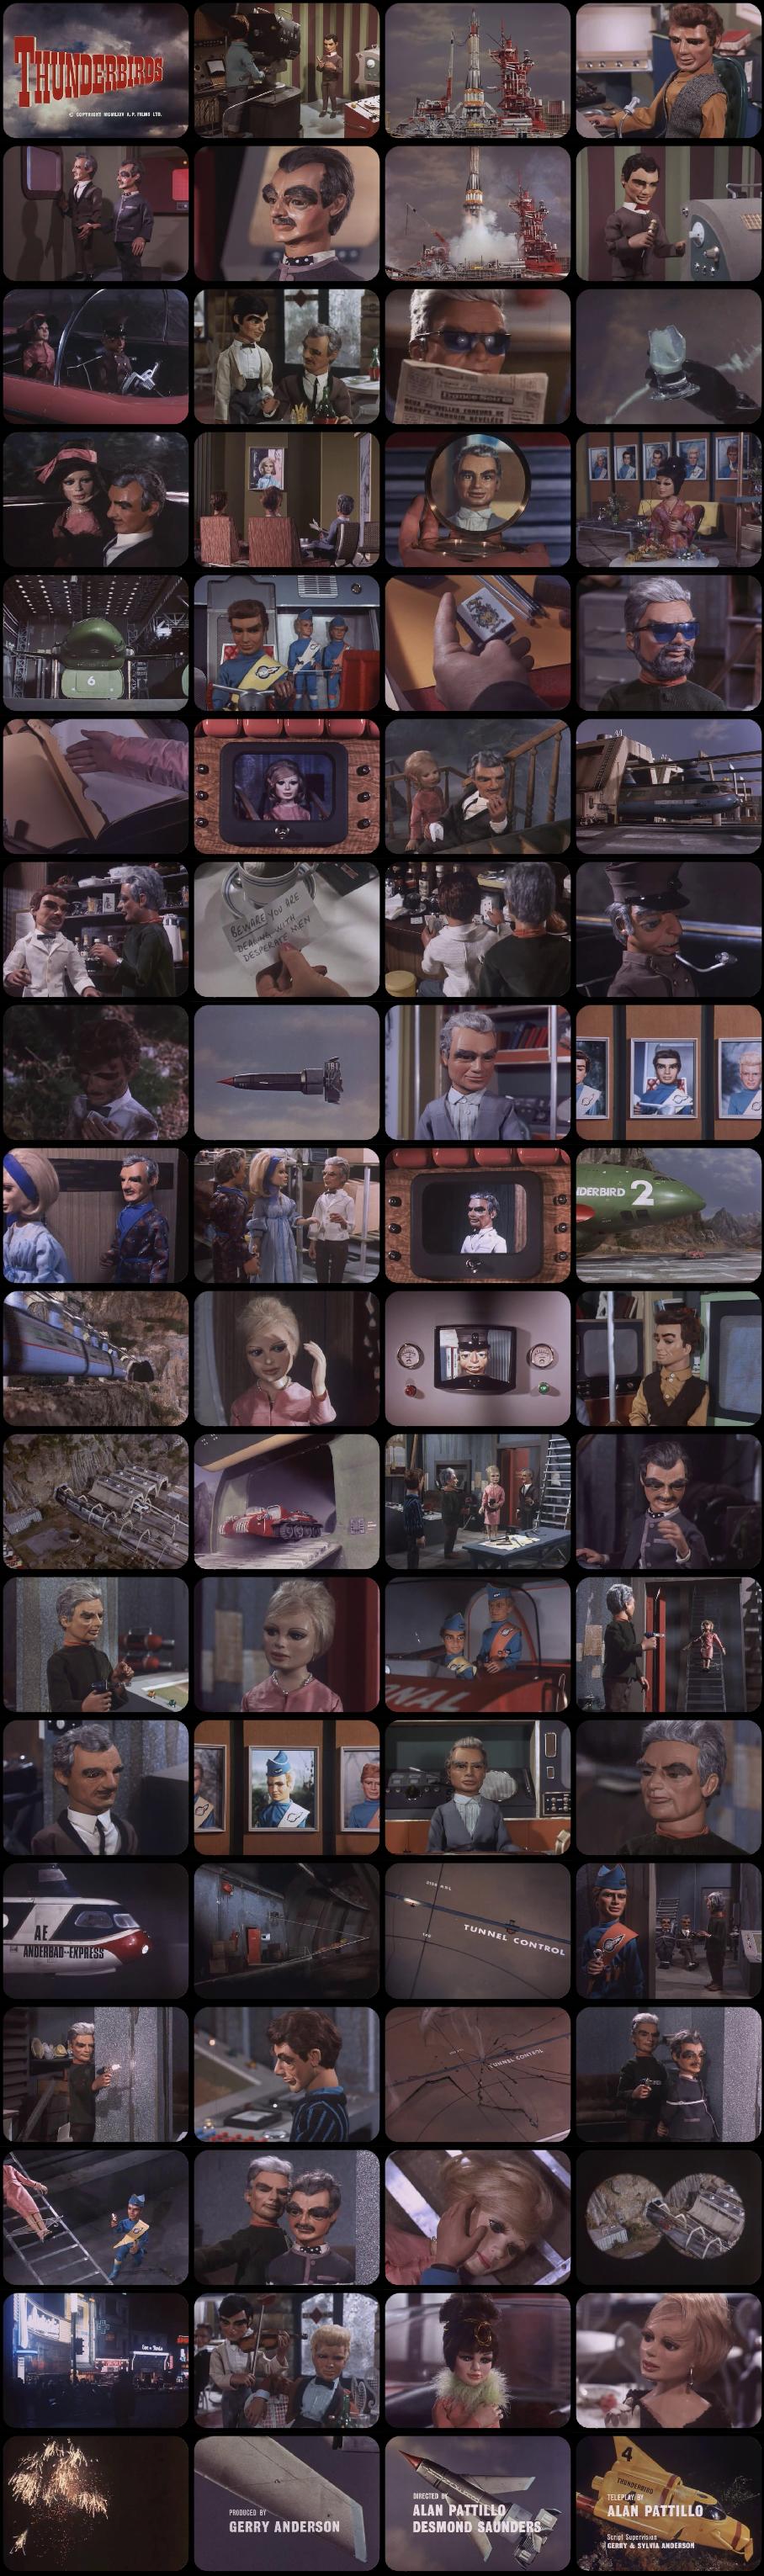 Thunderbirds Episode 3 Tele-Snaps